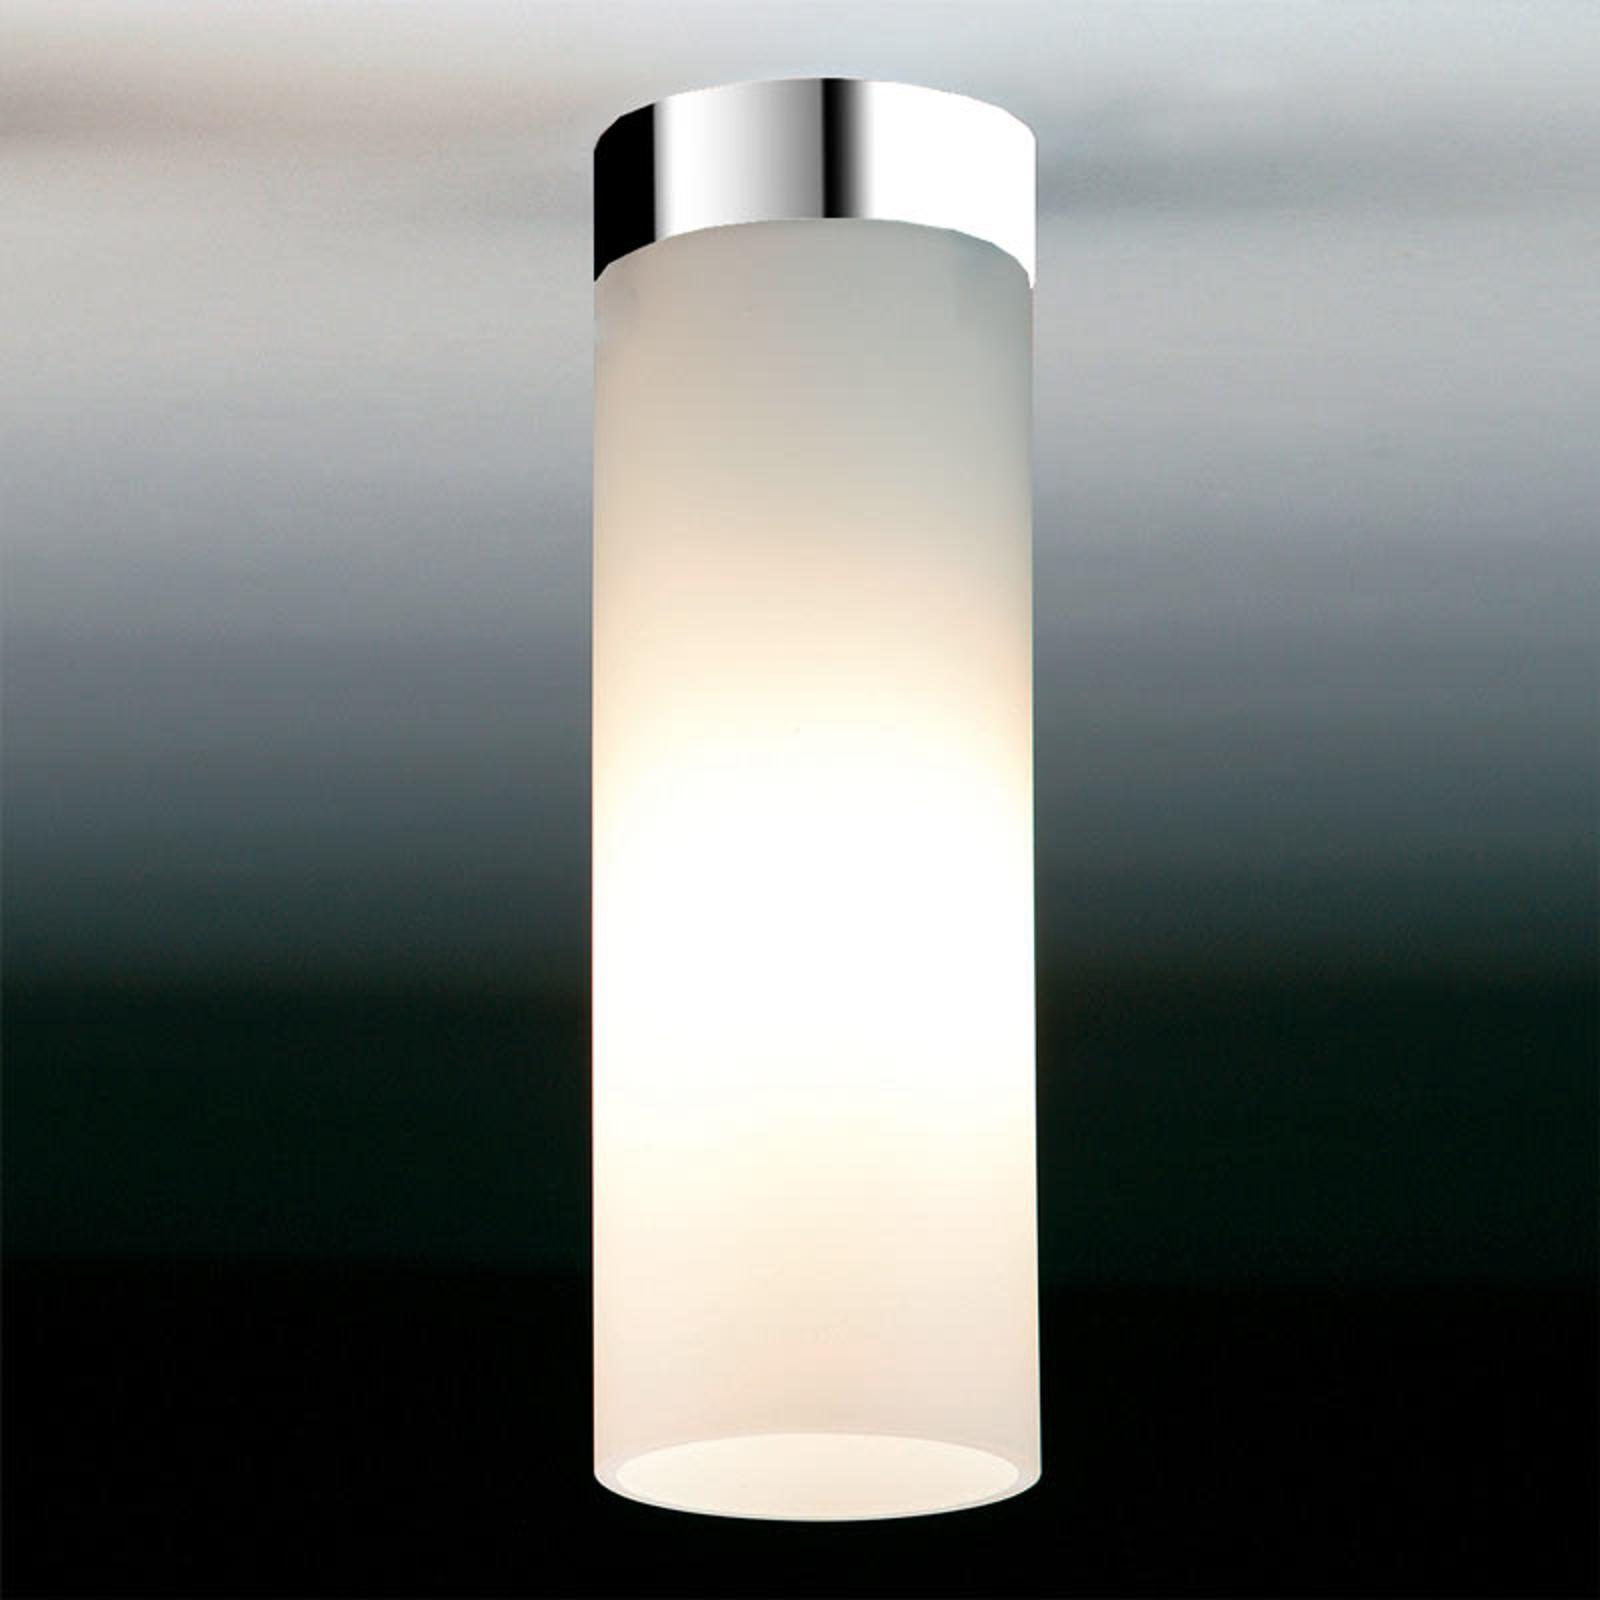 Biała matowa lampa sufitowa DELA BOX, chrom